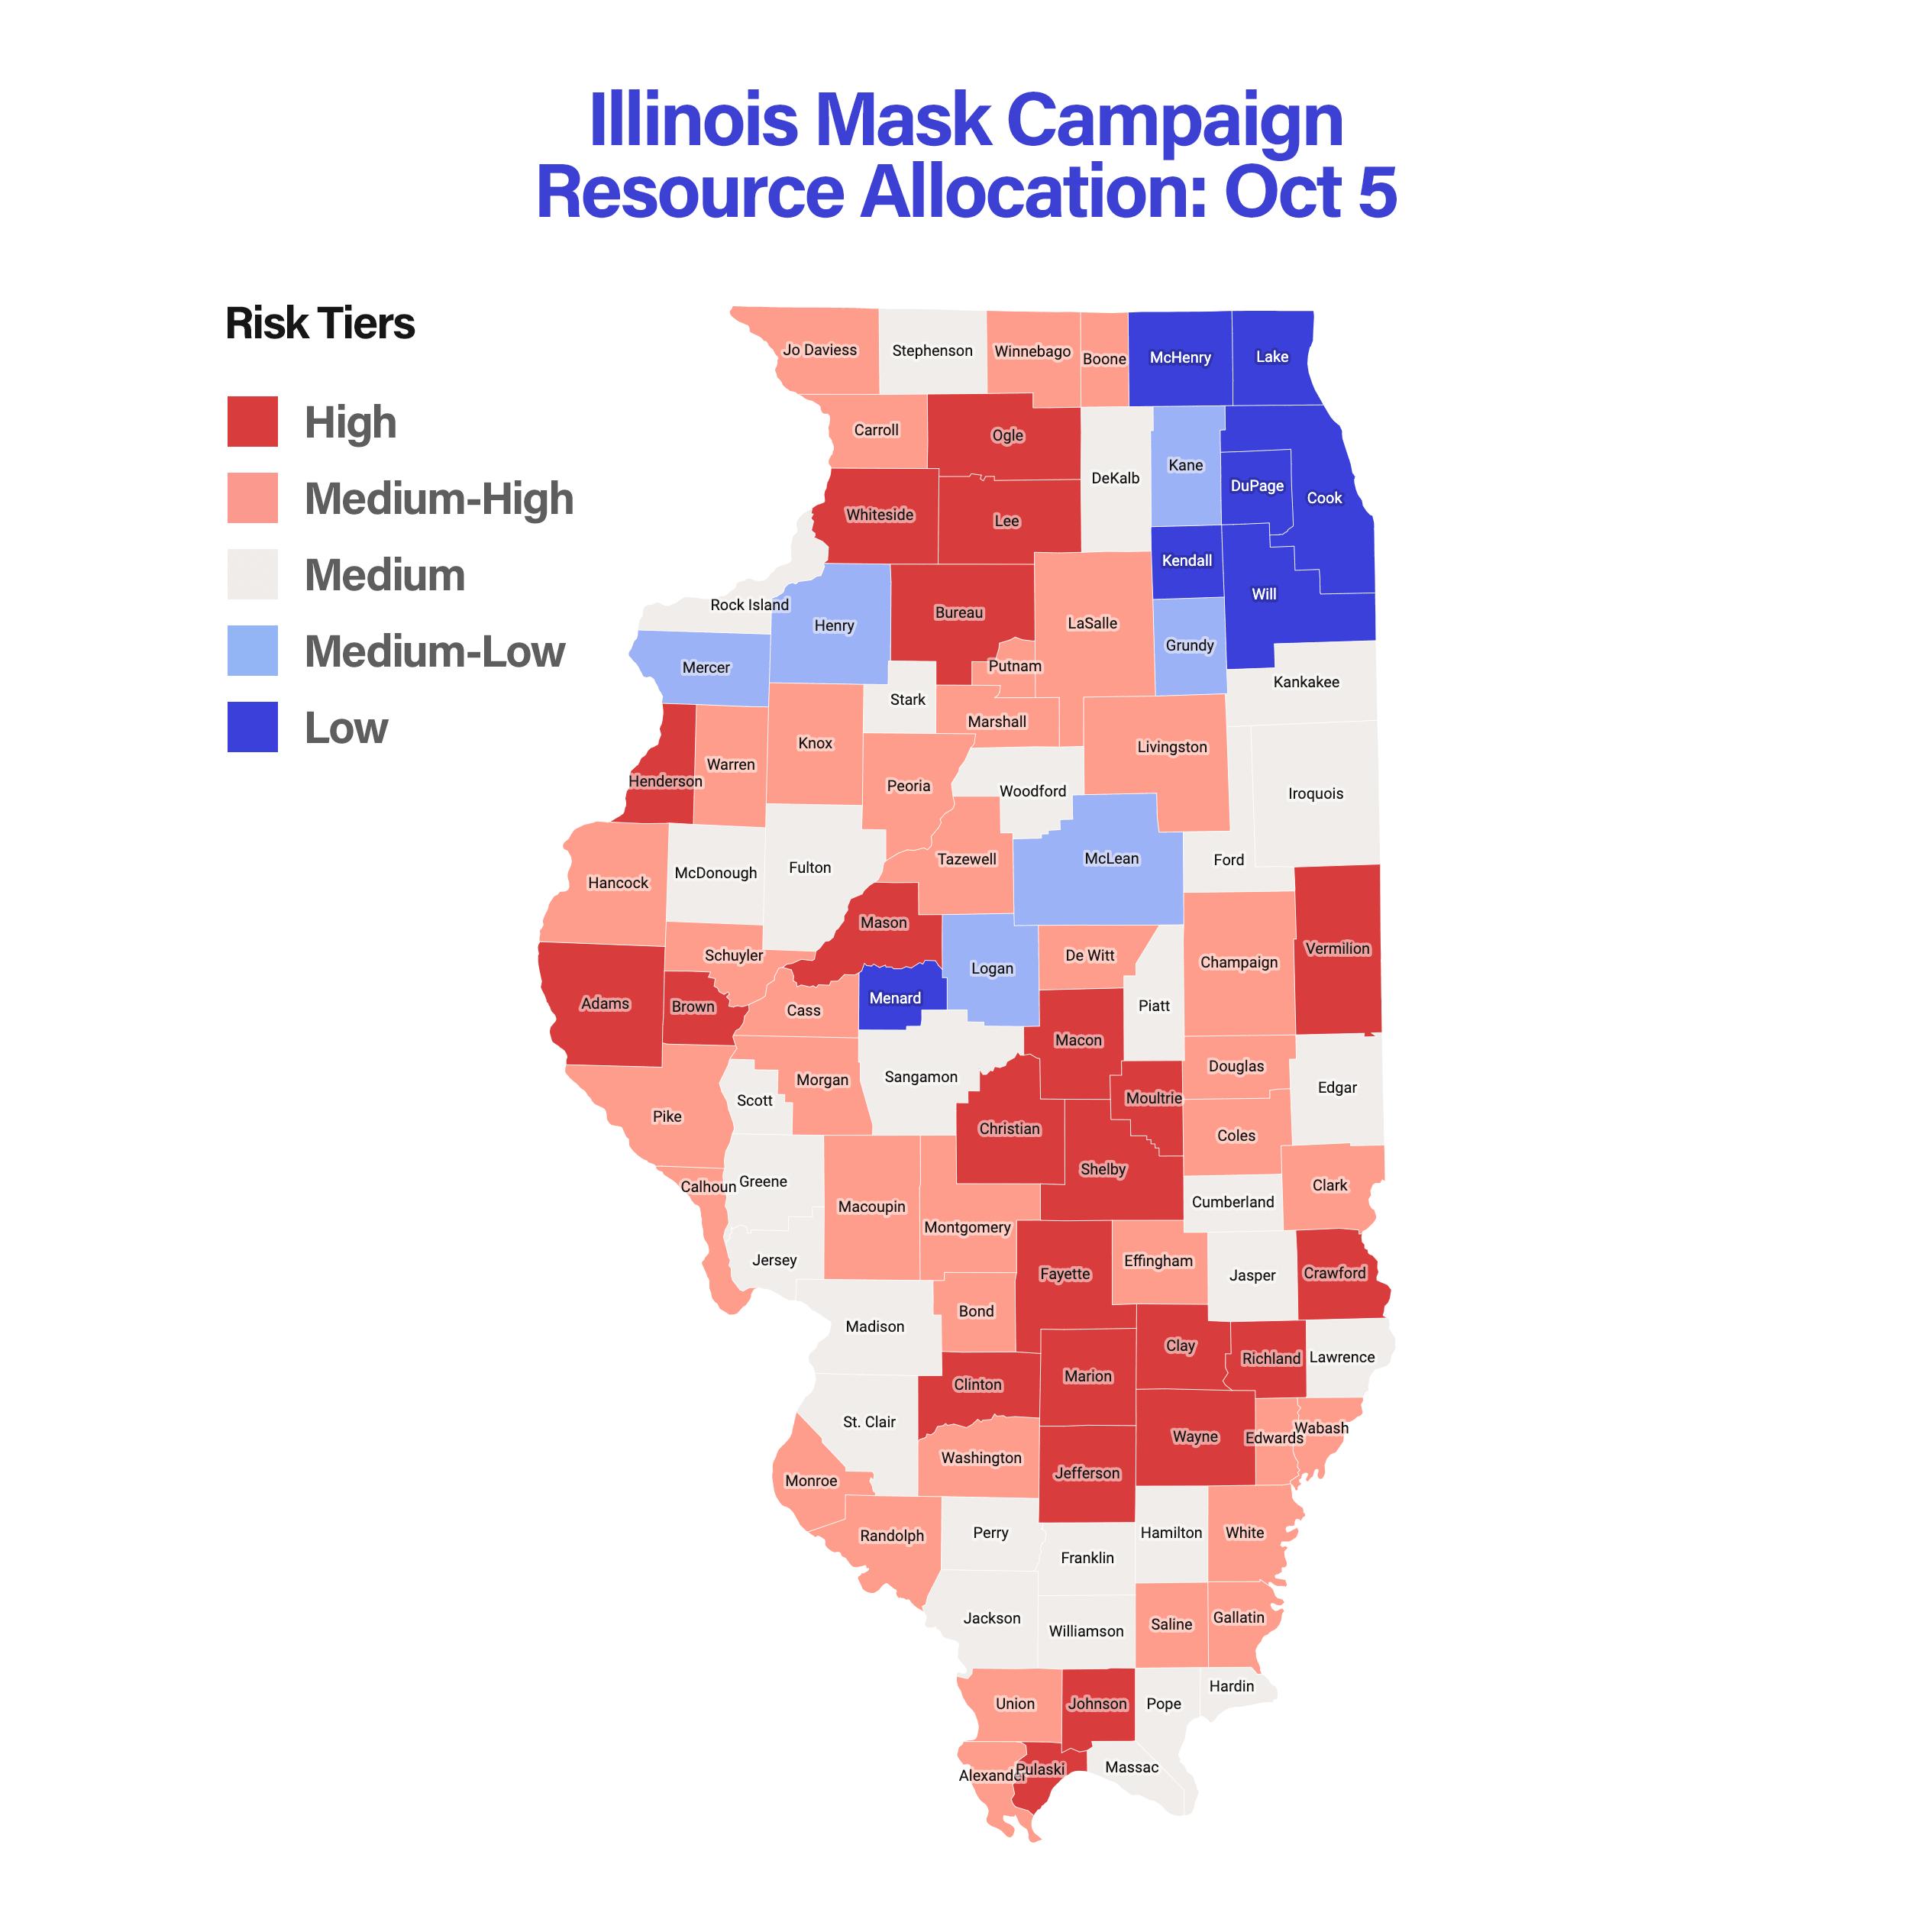 Illinois Mask Campaign Resource Allocation: Oct 5